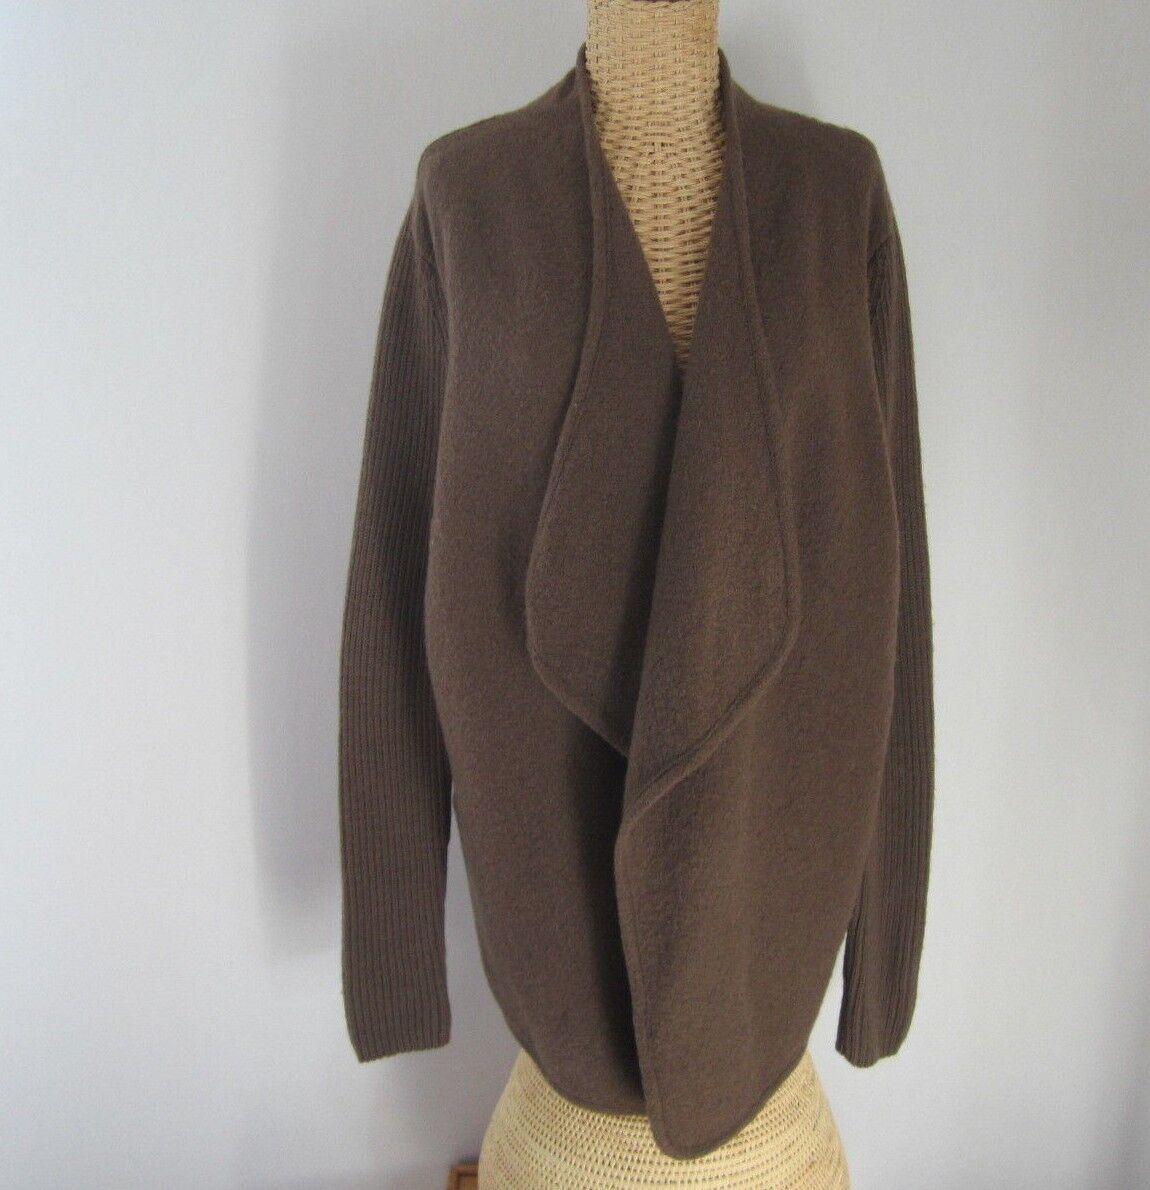 Vince Womens Medium Taupe Brown Boiled Wool Long Sleeve Sweatercoat Cardigan M